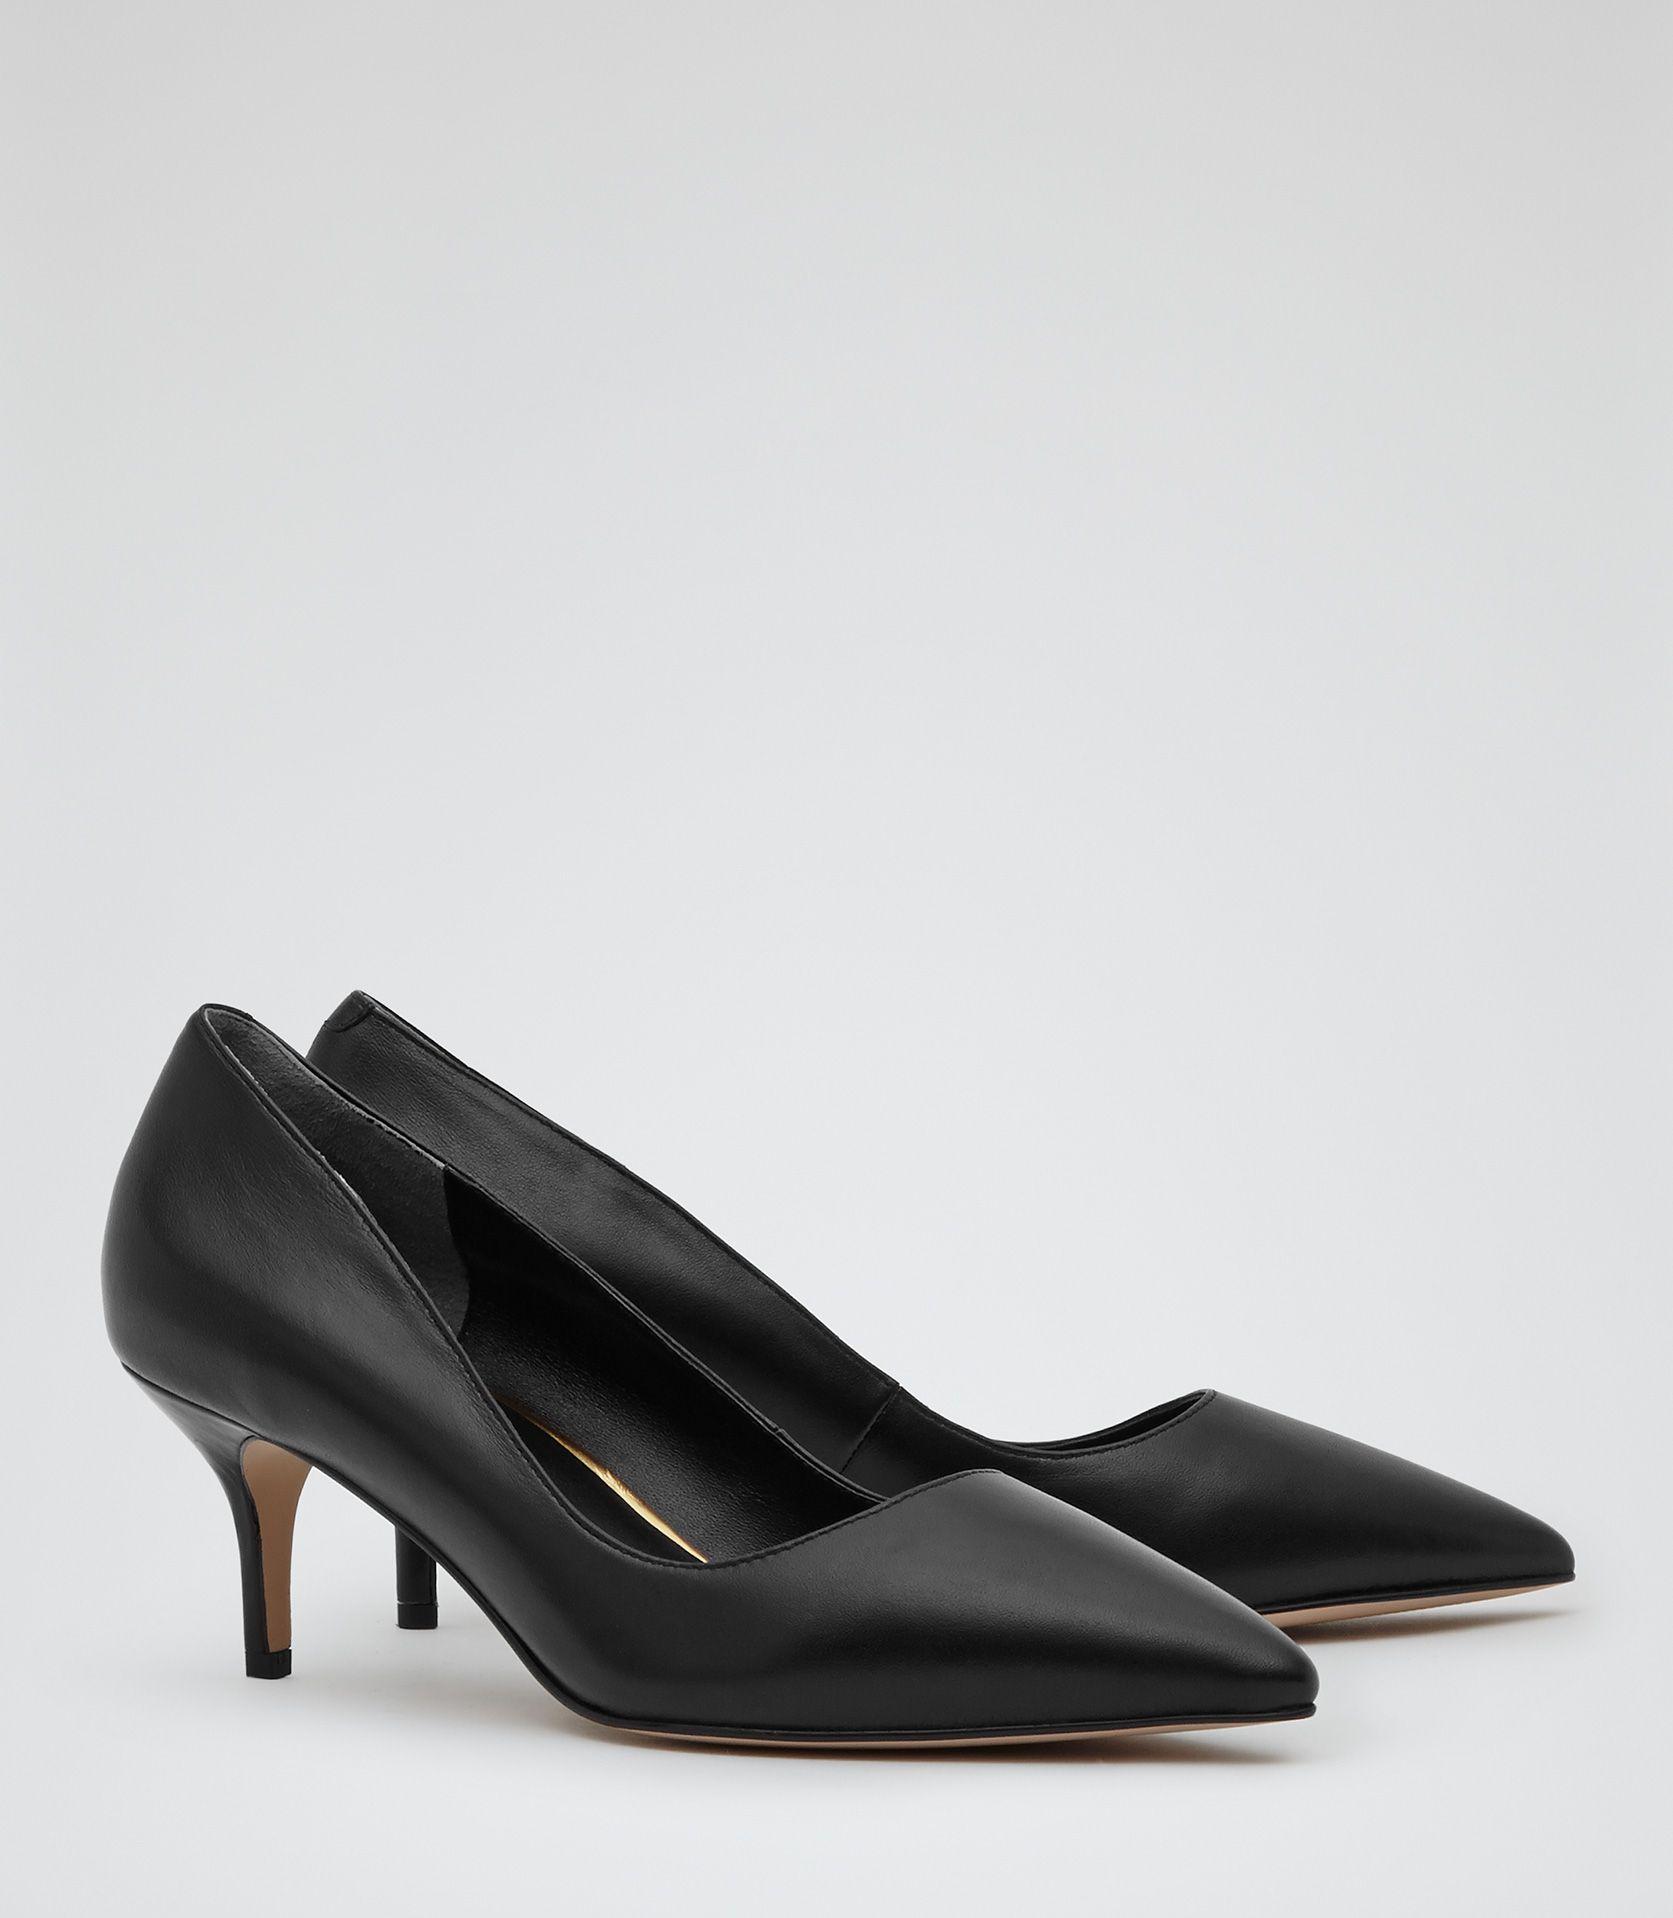 Holly Black Kitten Heel Court Shoes Reiss Ladies Shoes Designer Black Kitten Heels Kitten Heels